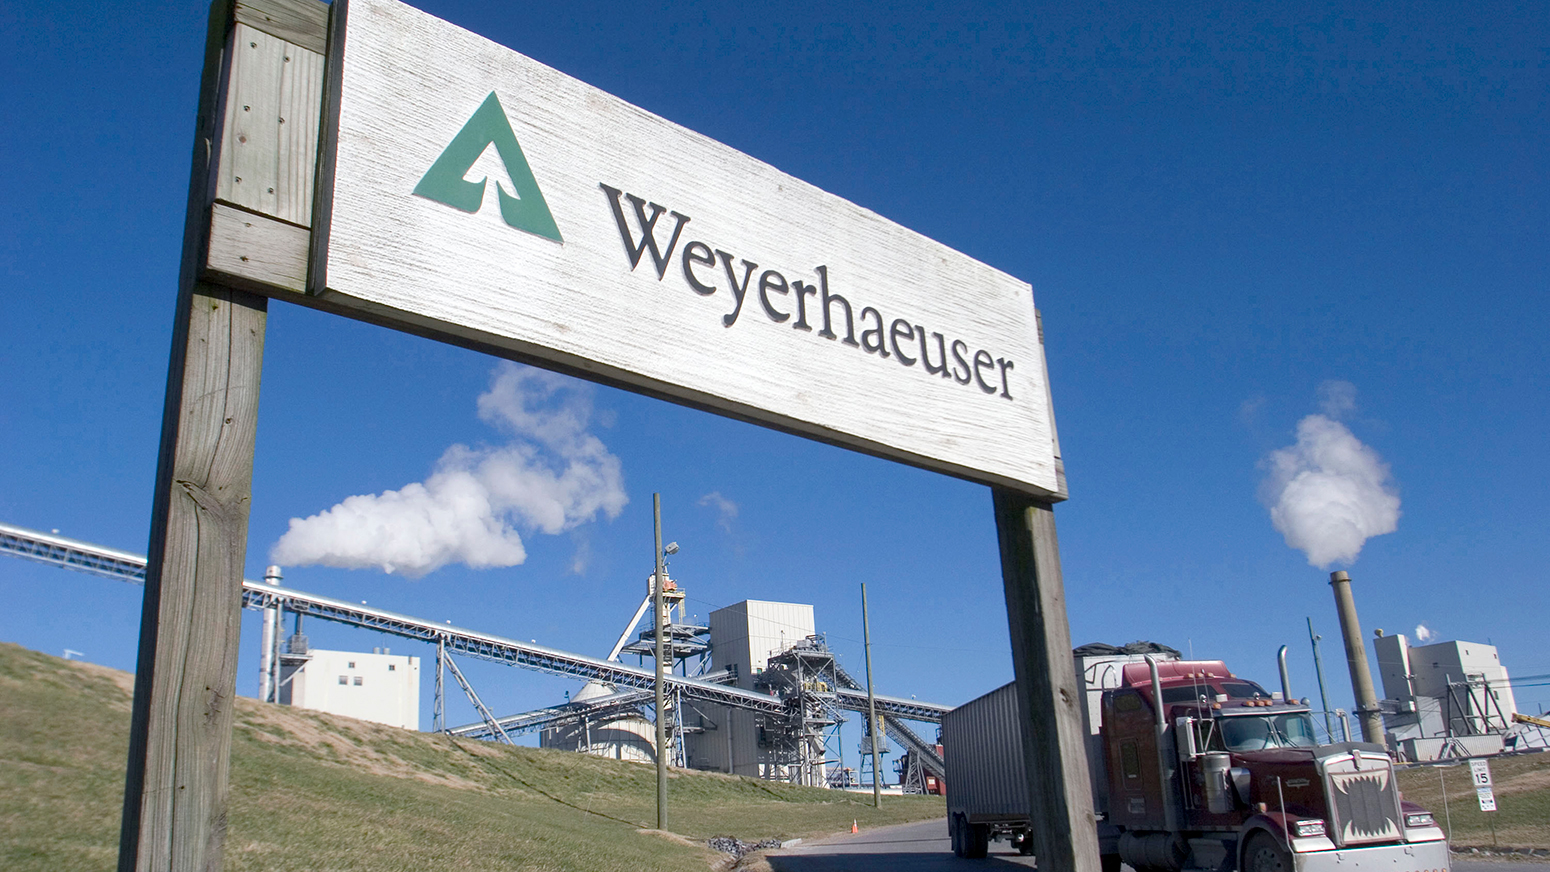 Weyerhaeuser reduces pension liabilities by $660 million